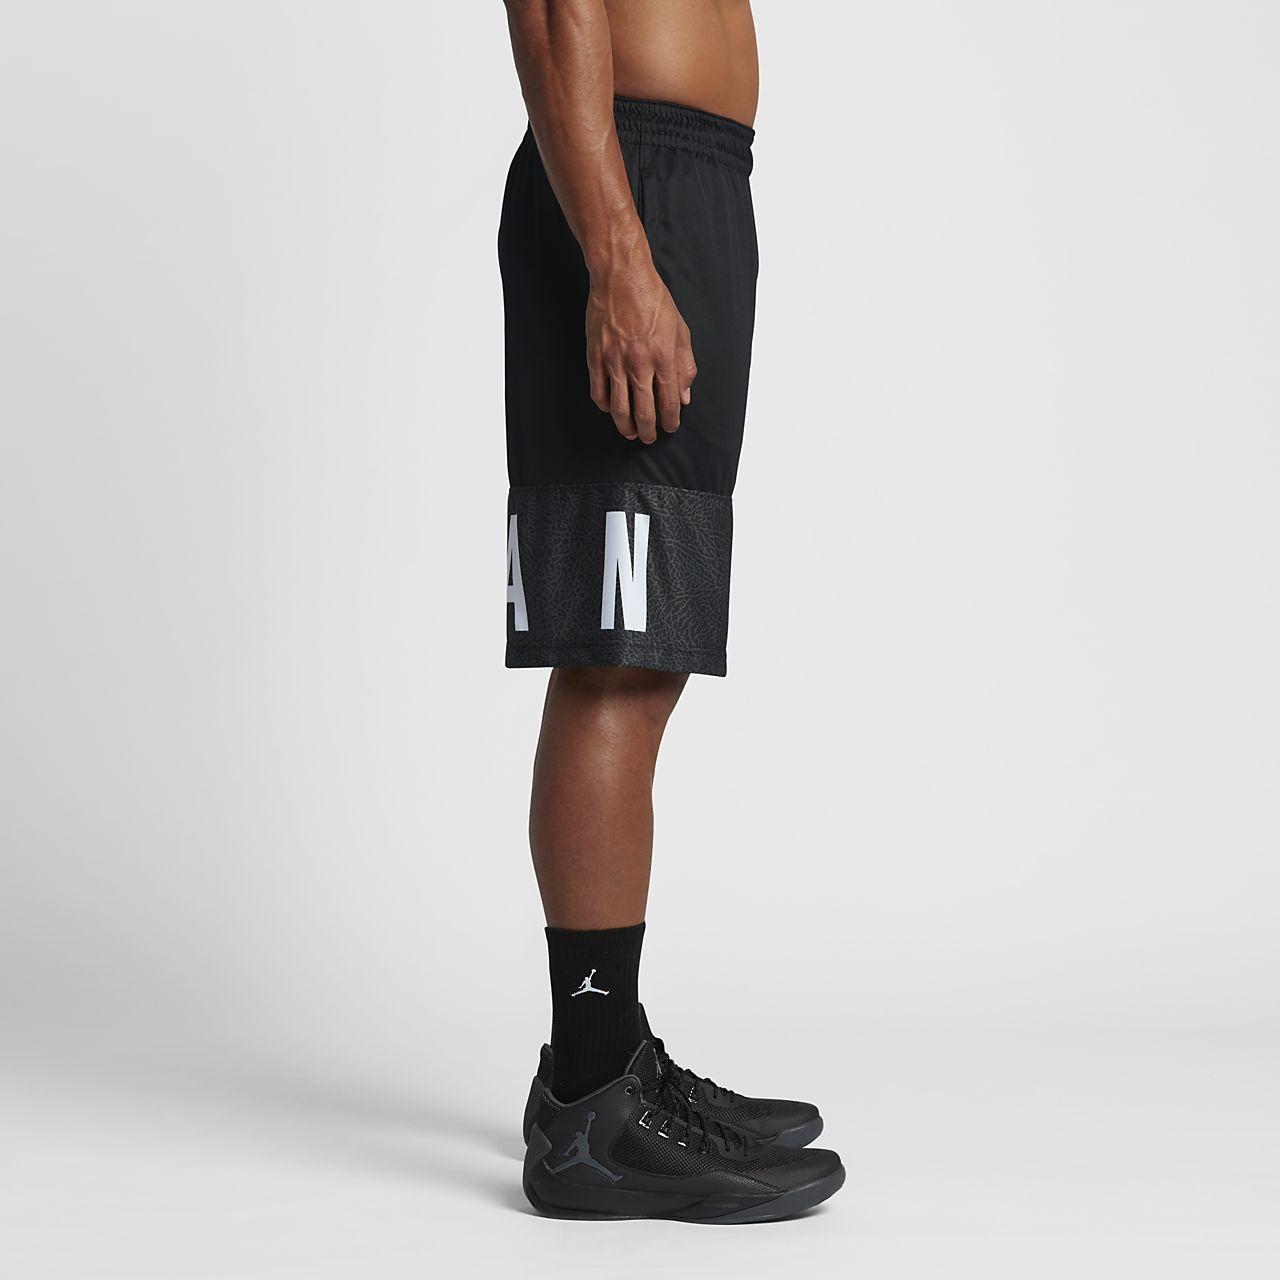 Nike Air Basketball Short